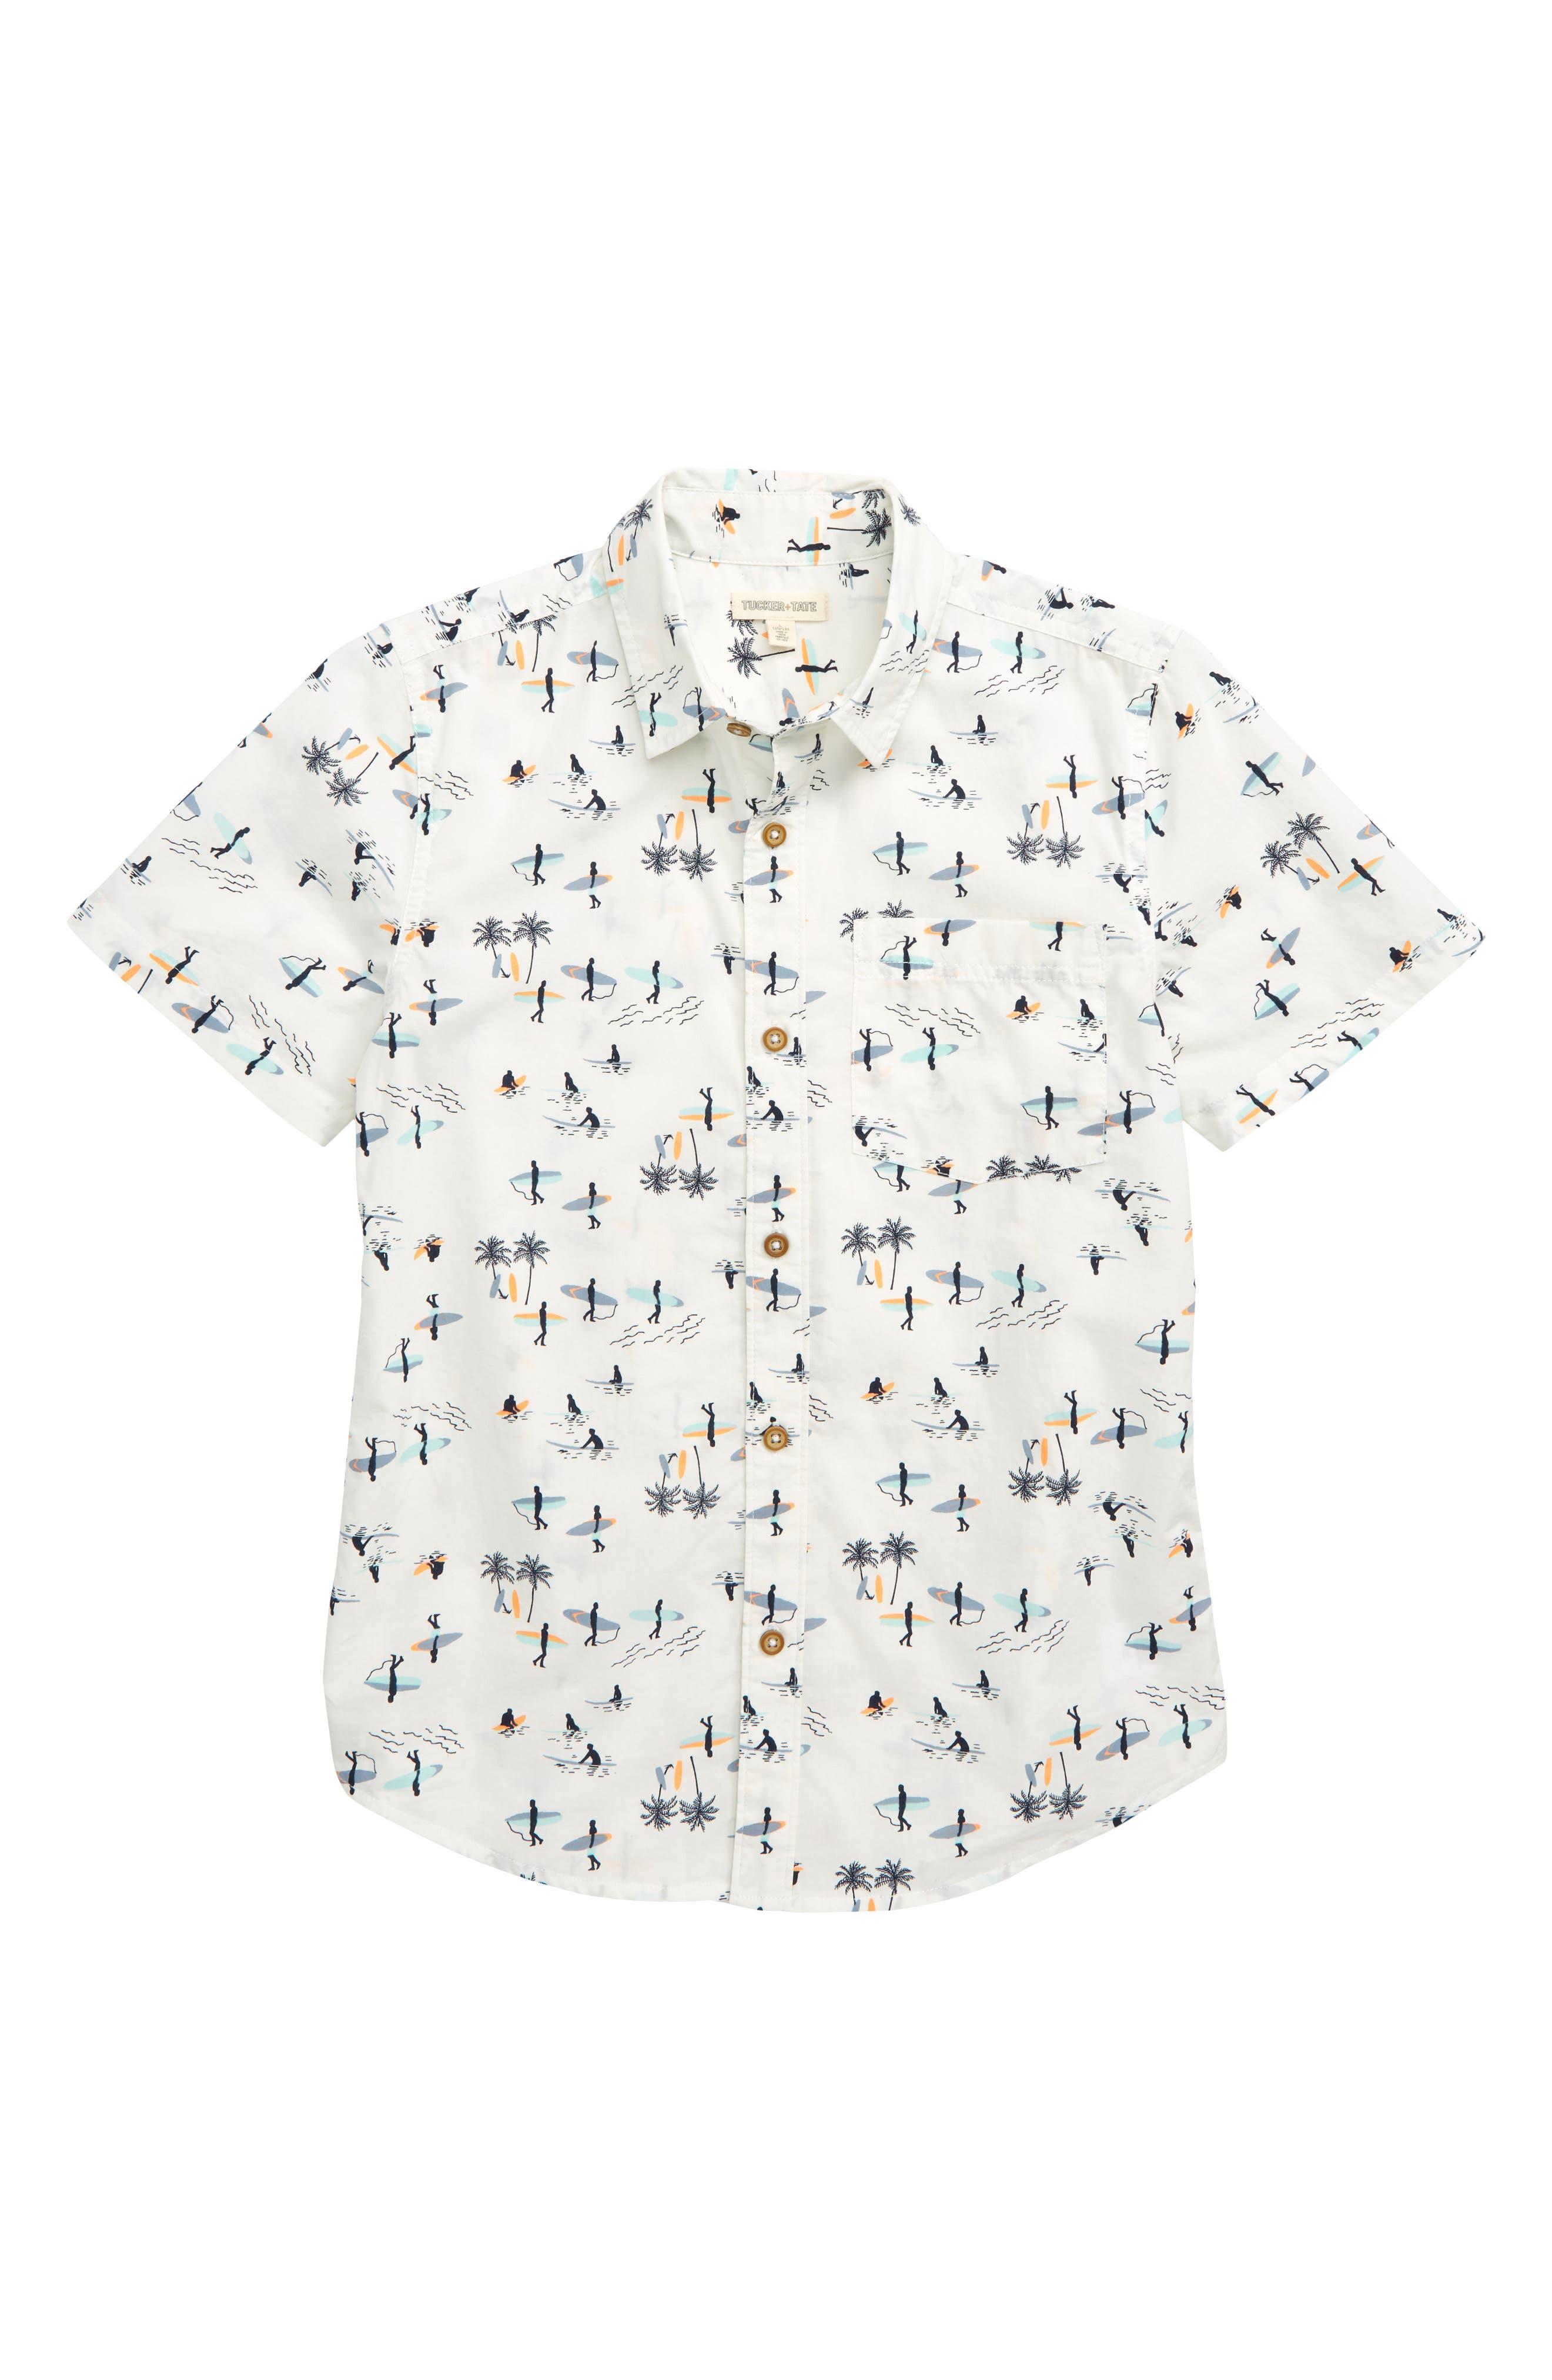 Boys Tucker  Tate Print Poplin Woven Shirt Size XL (1416)  White